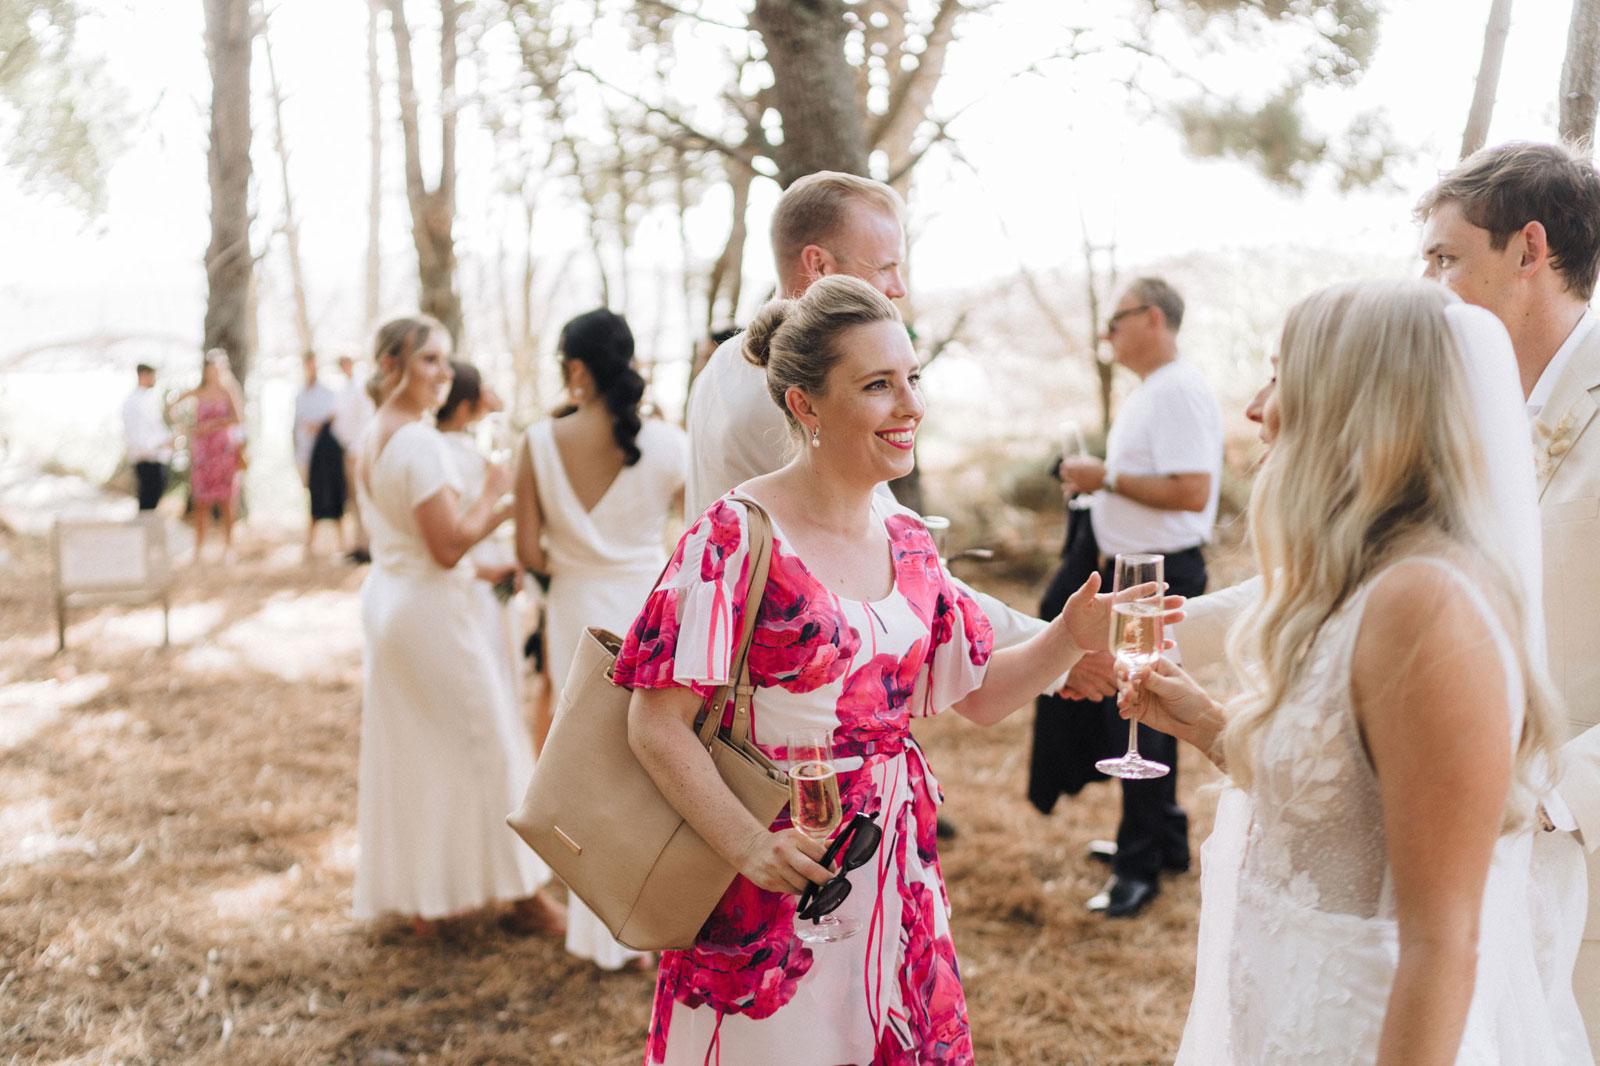 newfound-k-b-coromandel-wedding-photographers-065